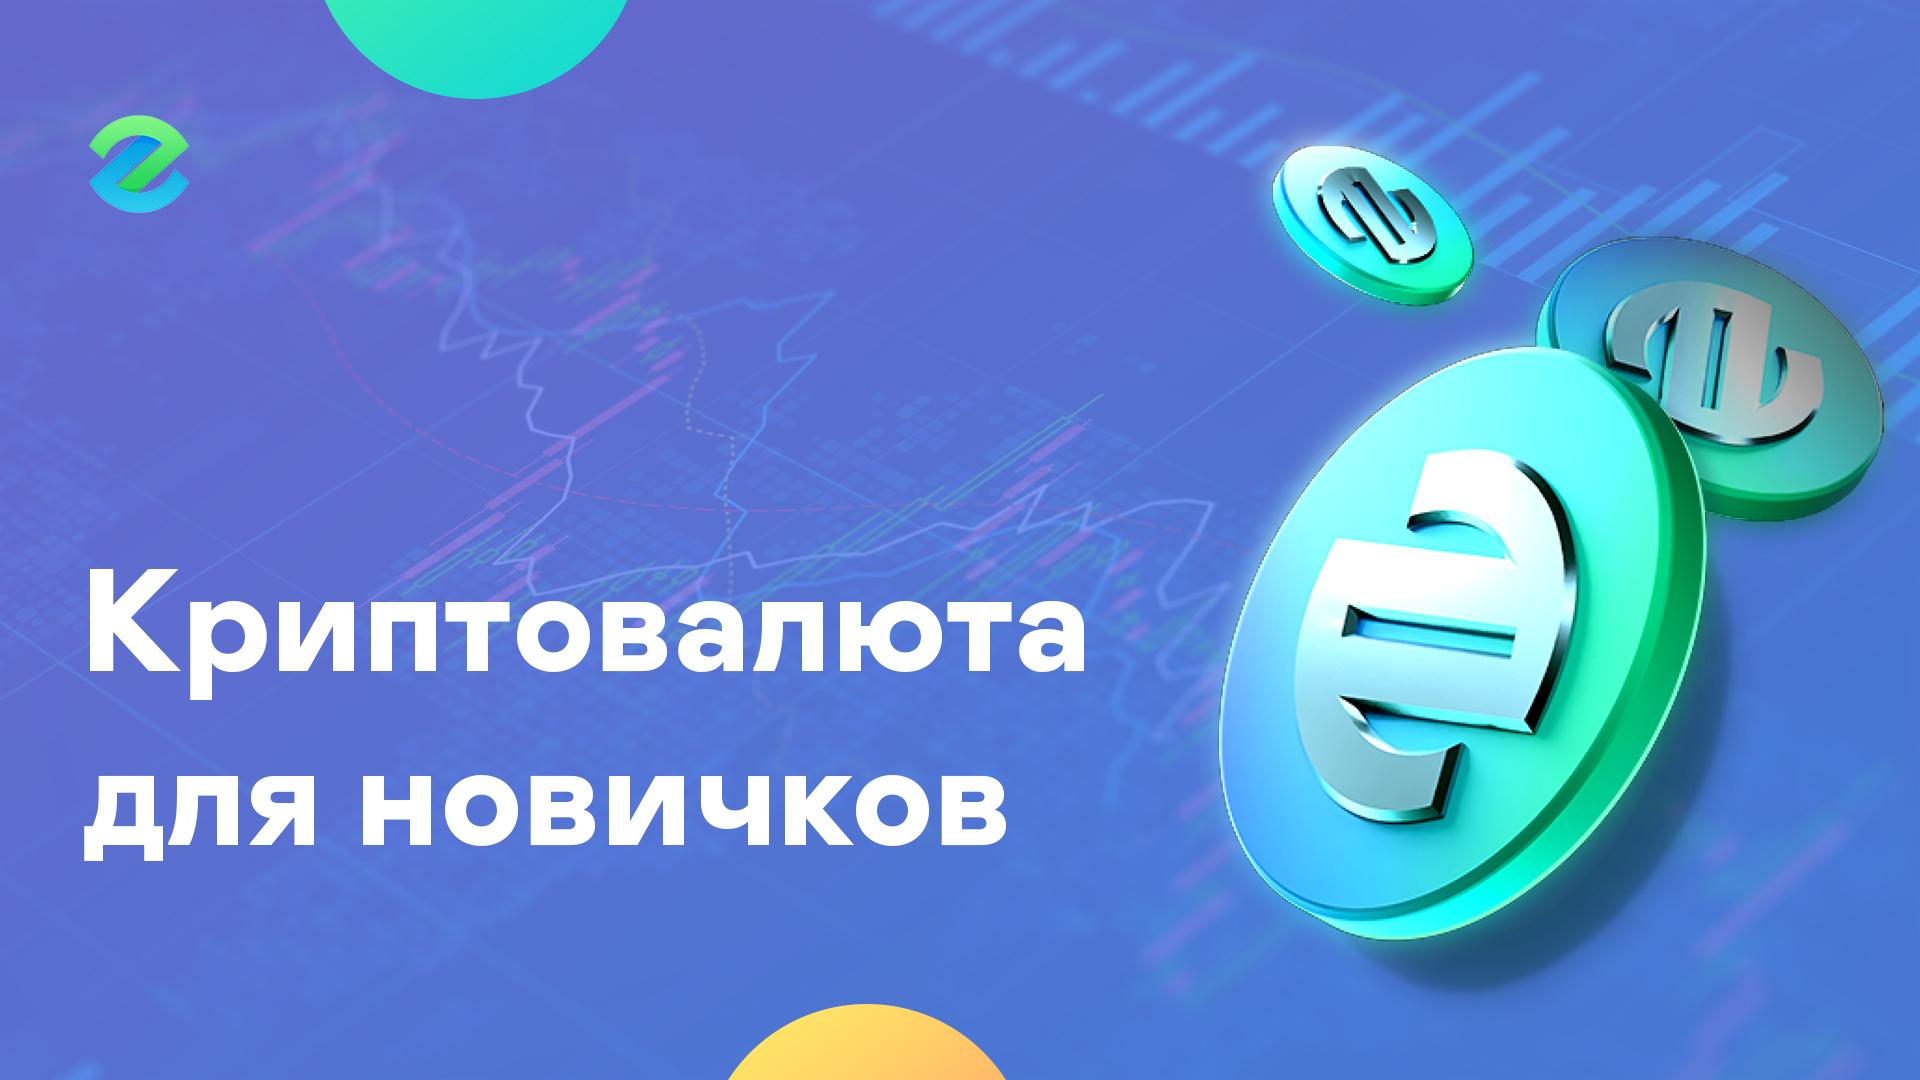 kriptovaljuta dlja novichkov - Криптовалюта для новичков